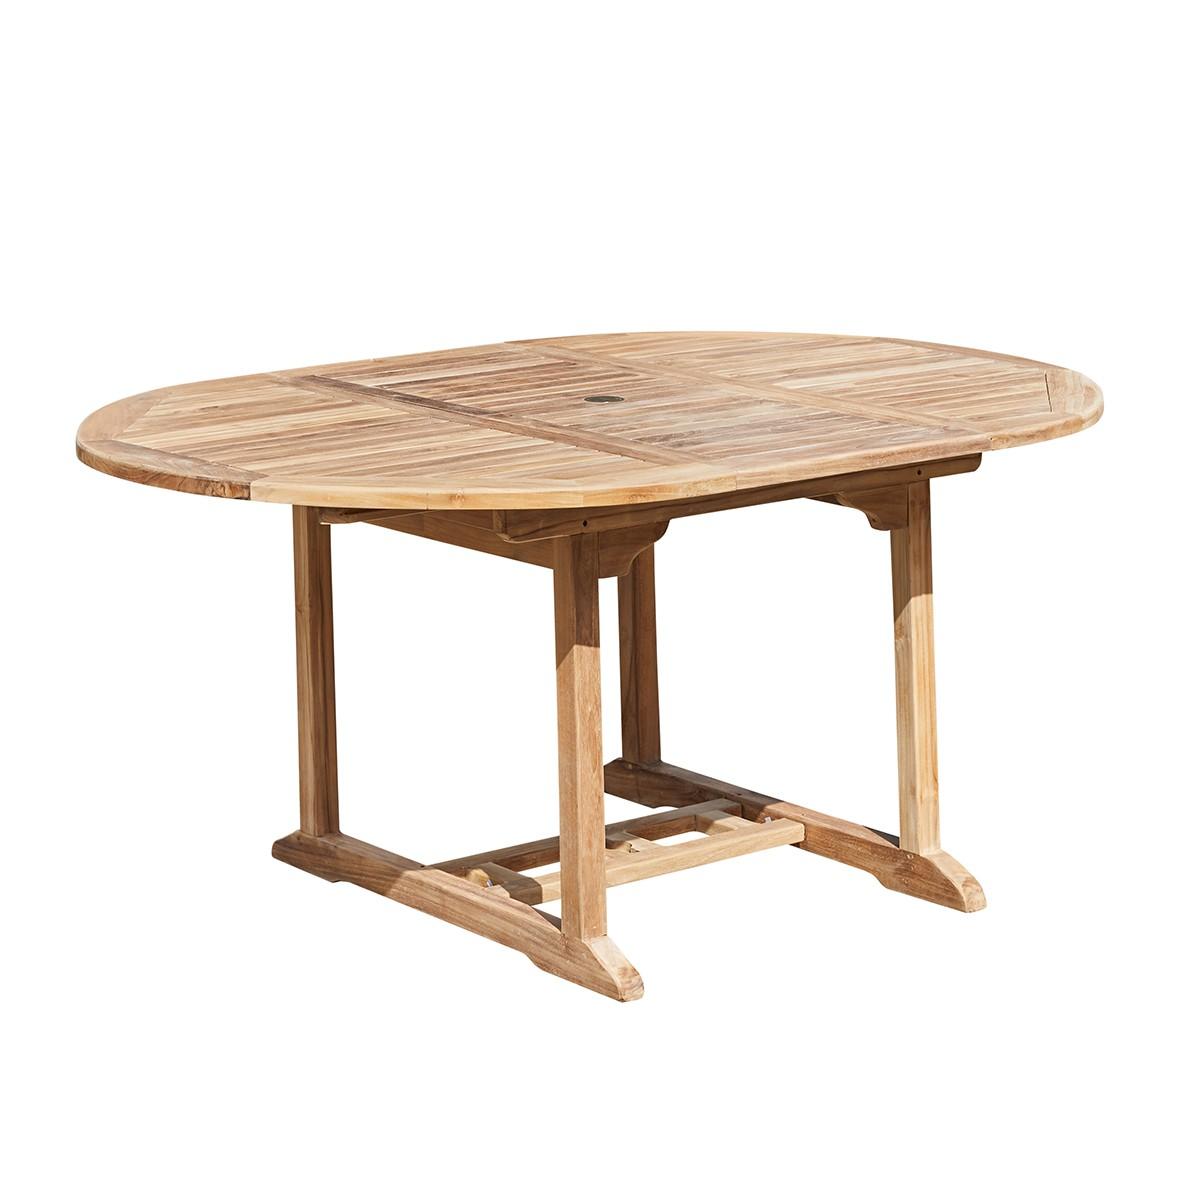 Table de jardin extensible en teck 6/8 personnes